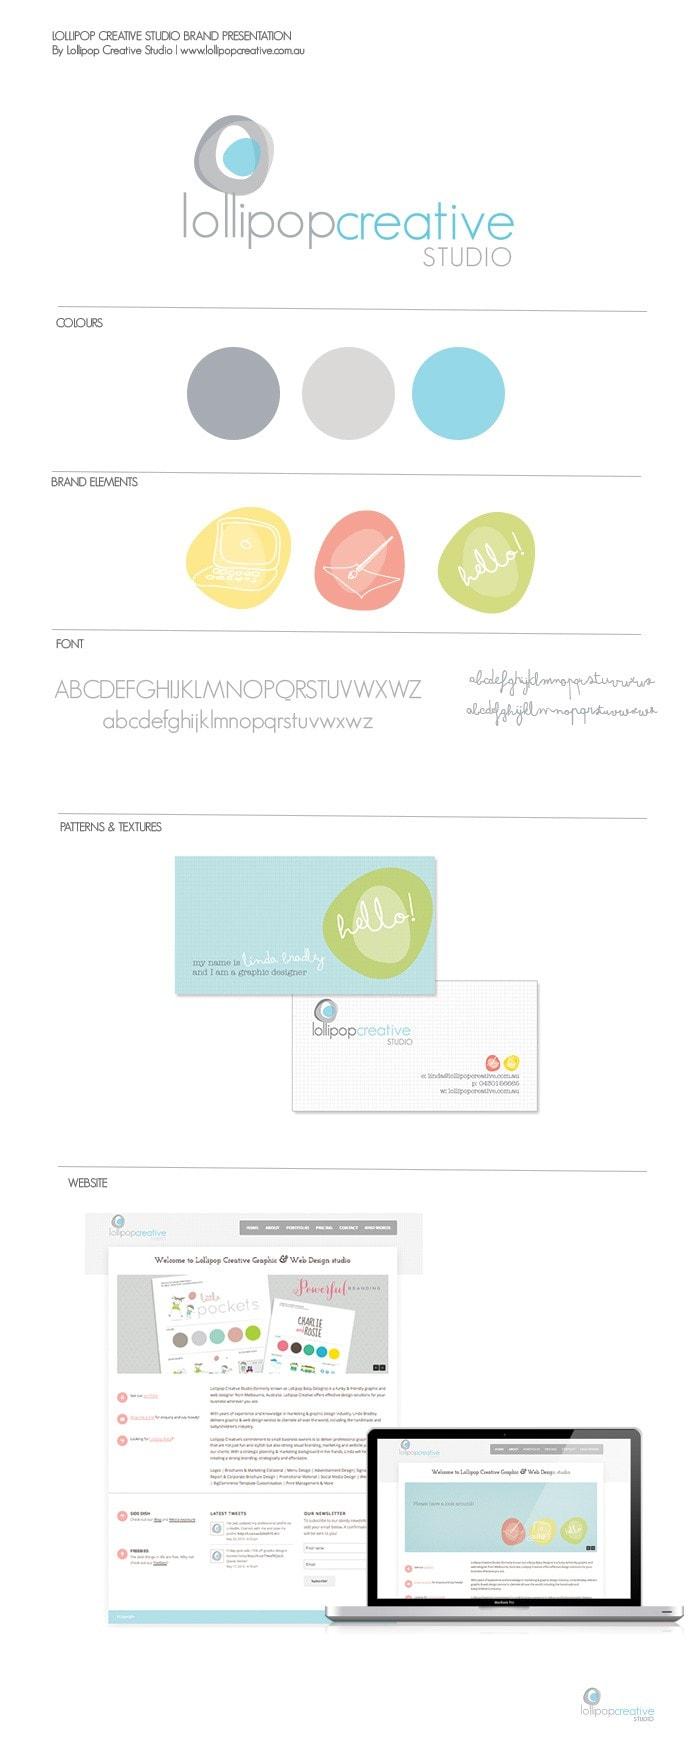 Lollipop Creative Studio Logo Design,  Brandboard